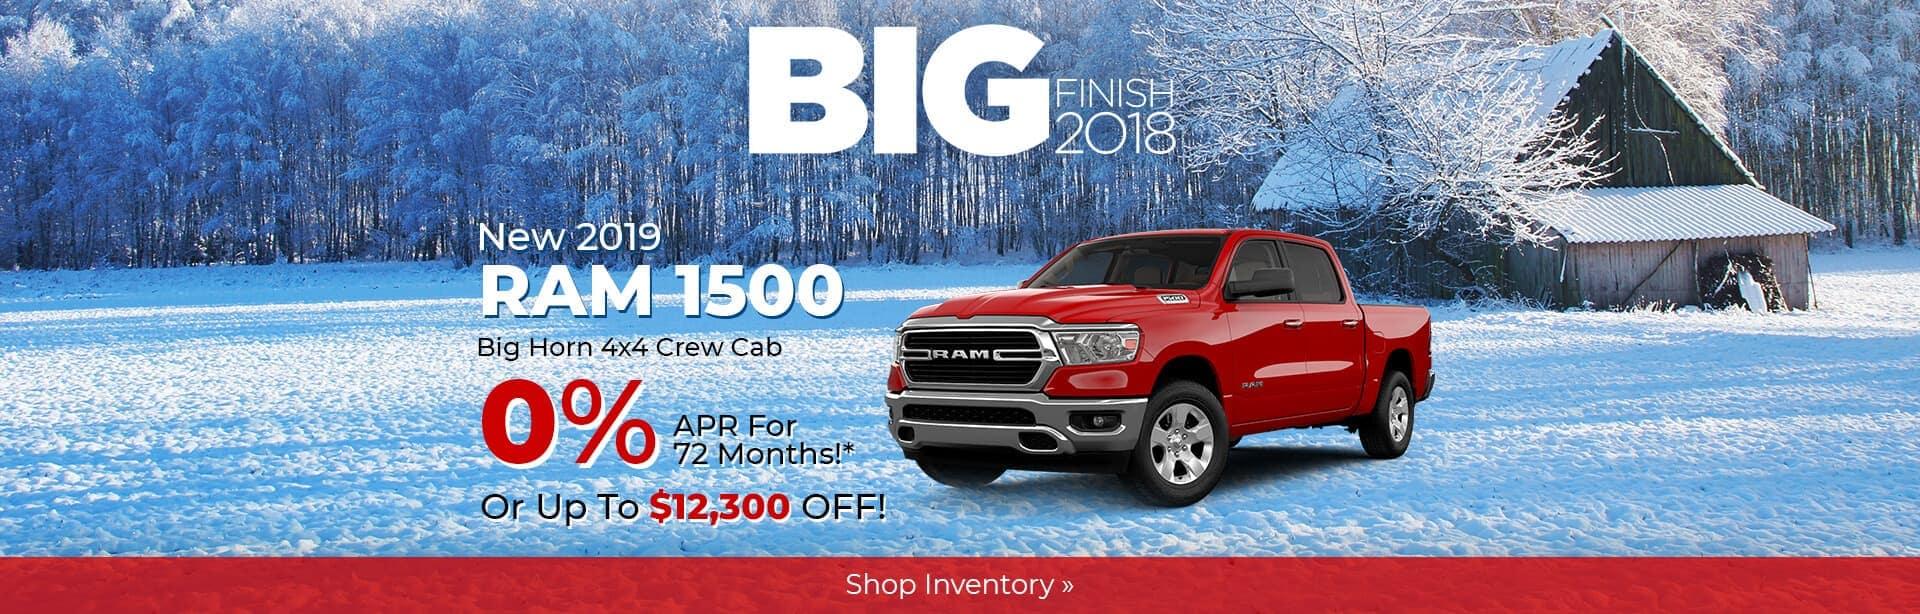 2019 Ram 1500 Big Horn 0% APR near Lafayette, Indiana.